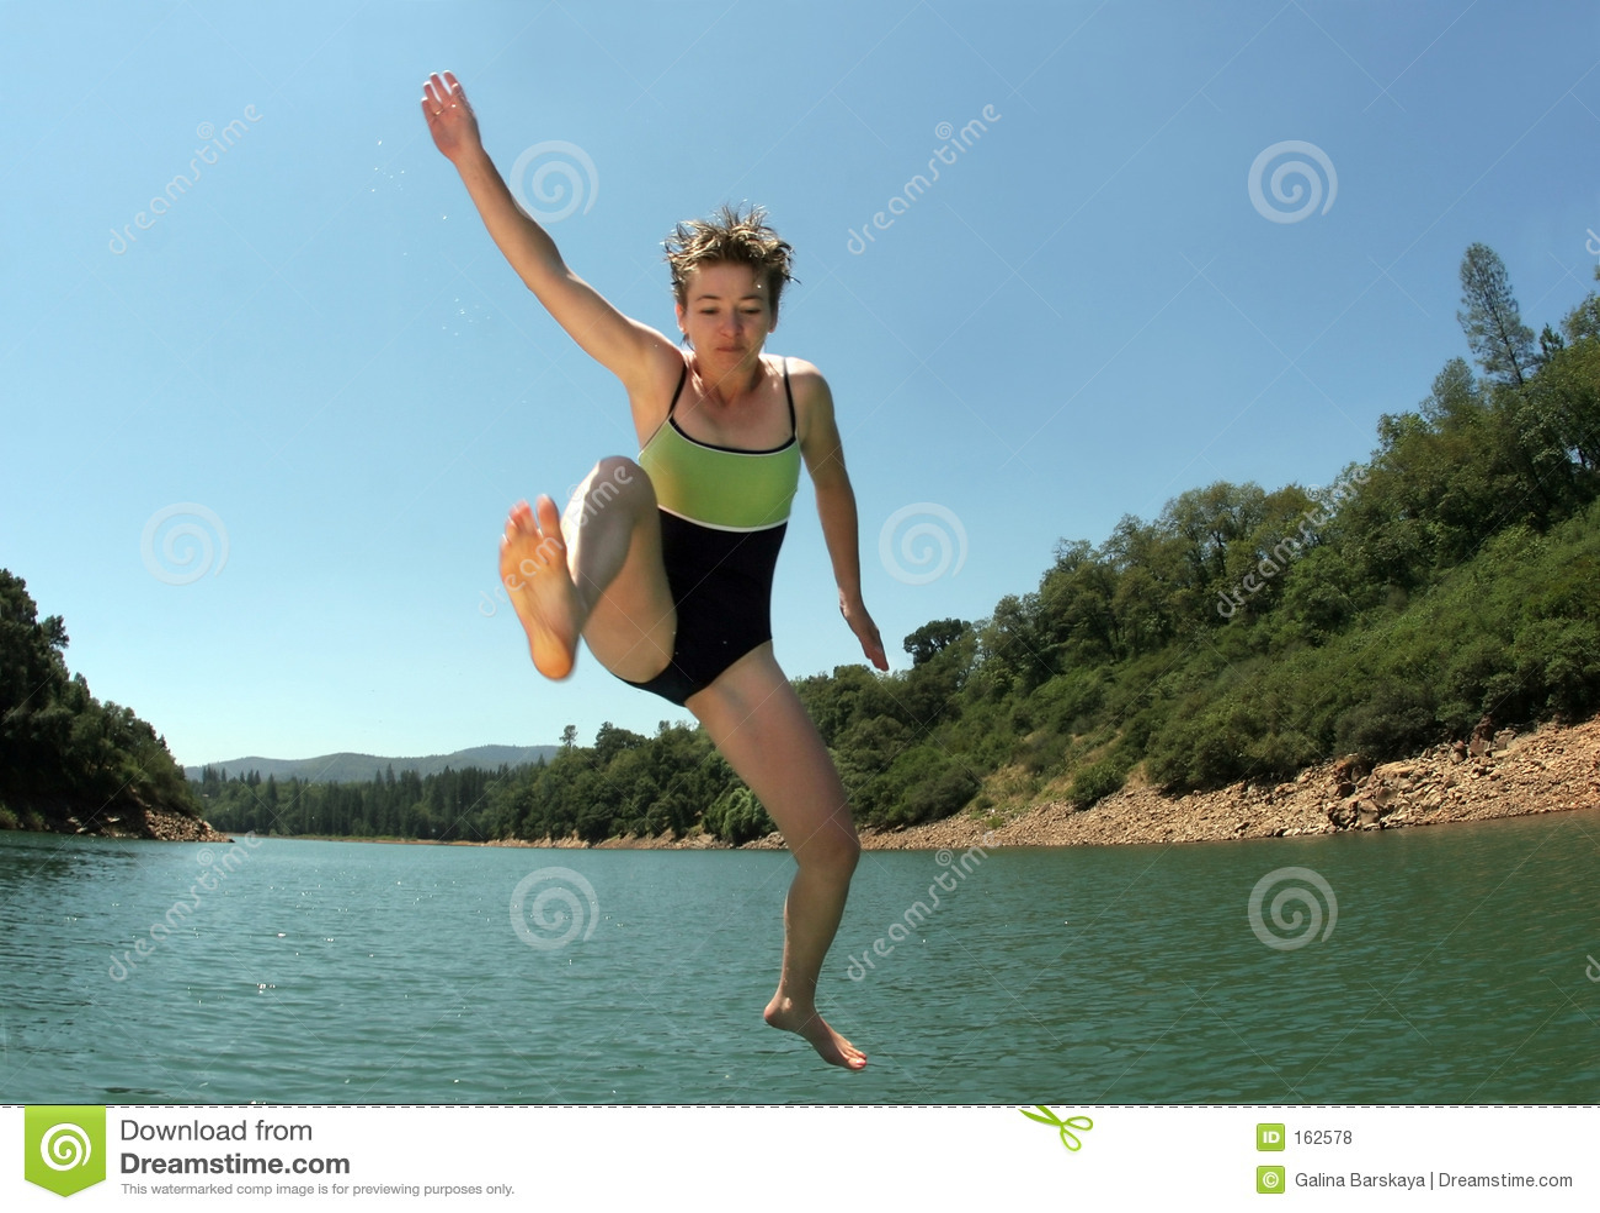 Springen in den See